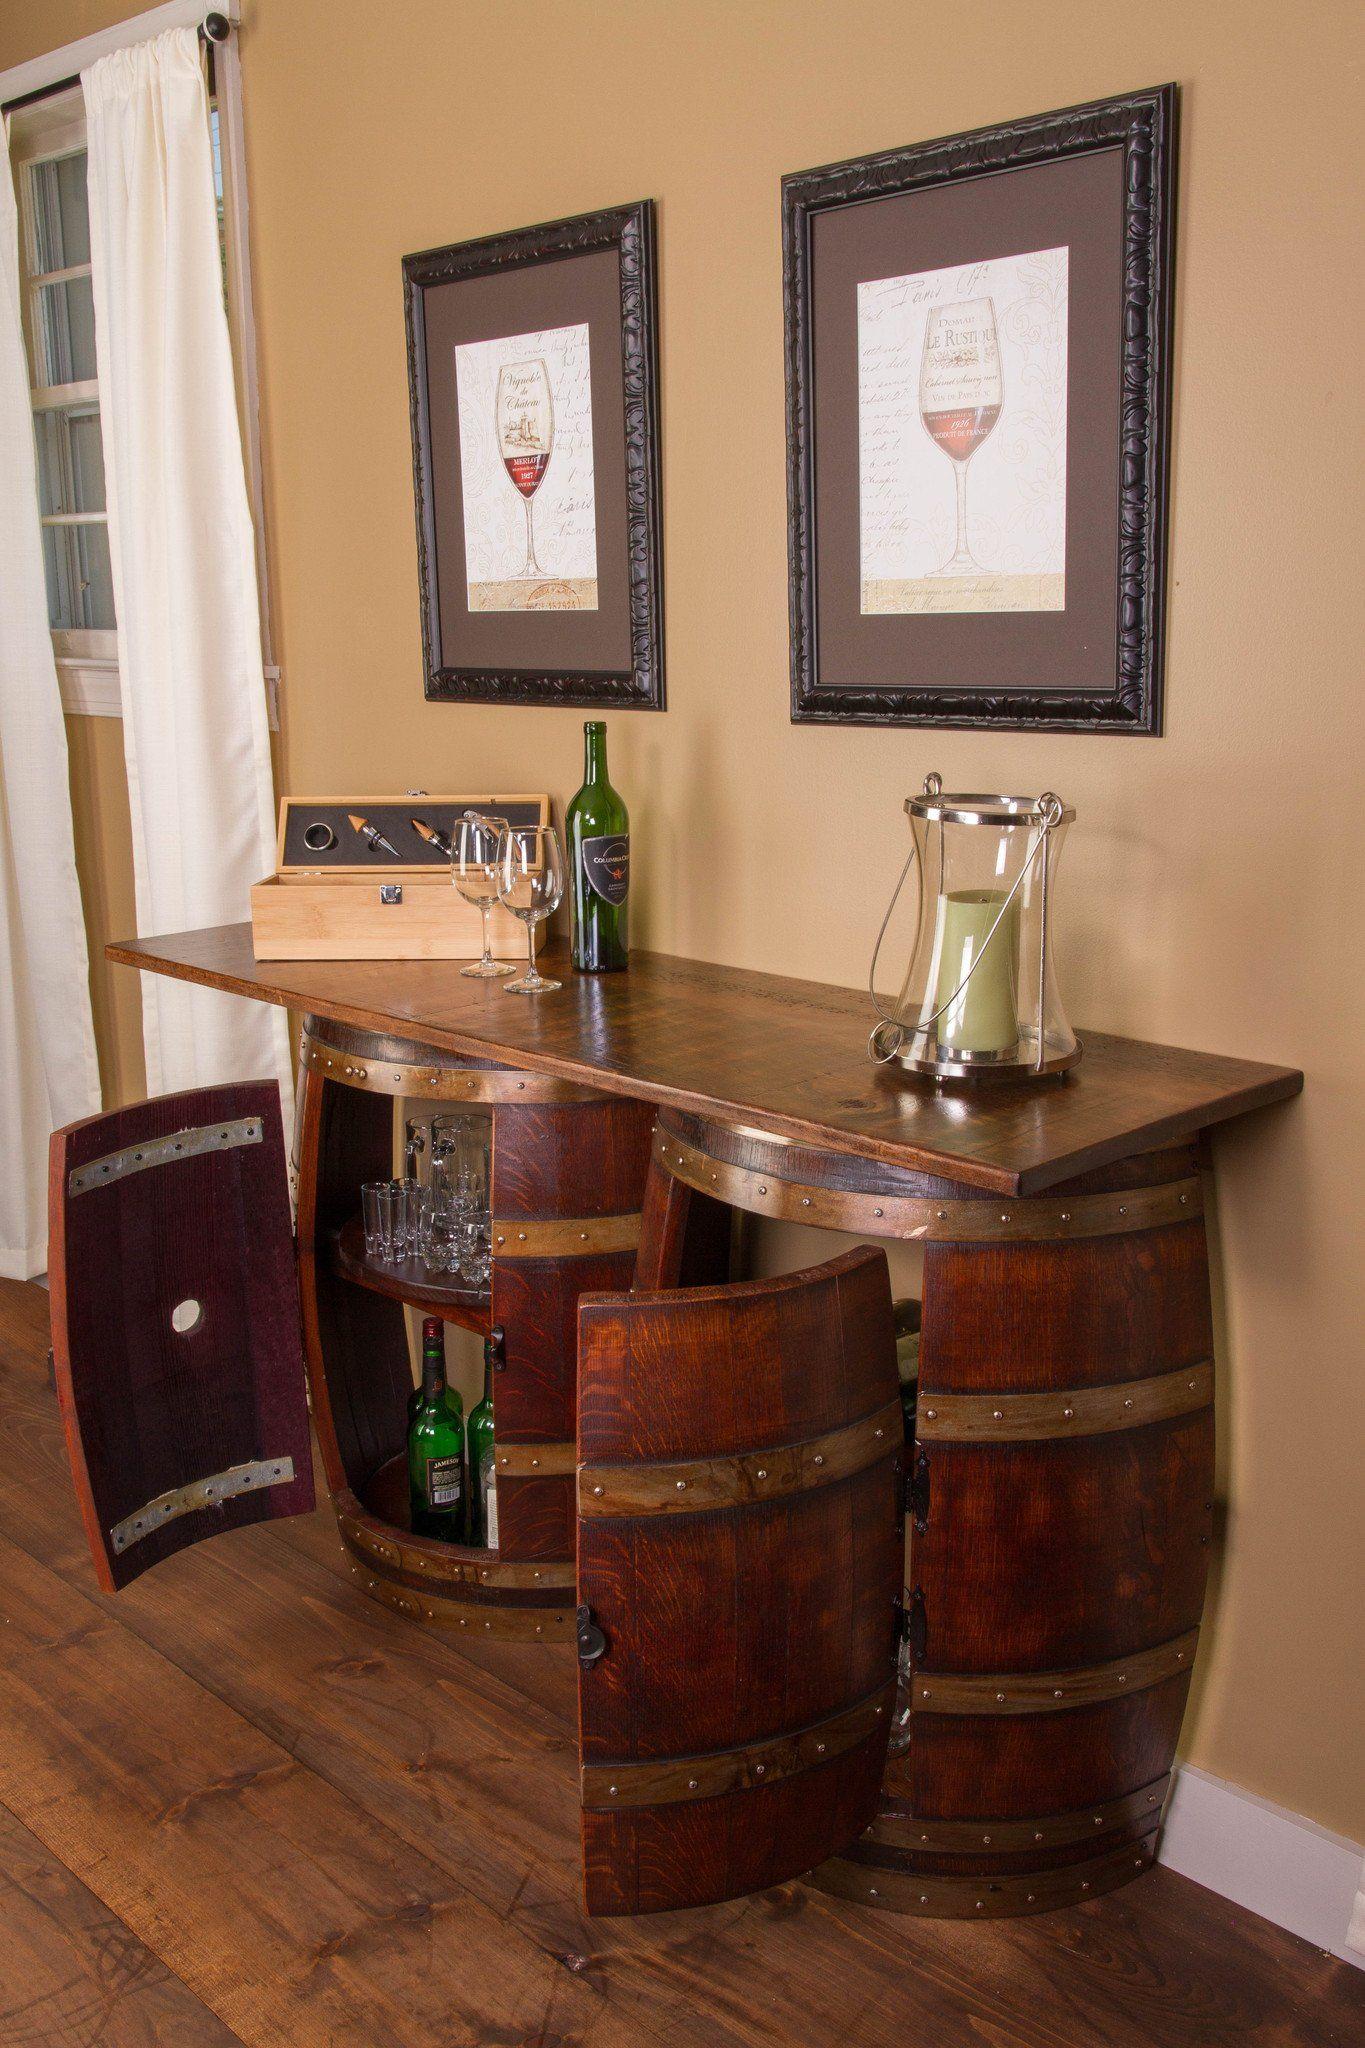 Deco Tonneau De Vin double half barrel bar - wall mount this amazing bar gives